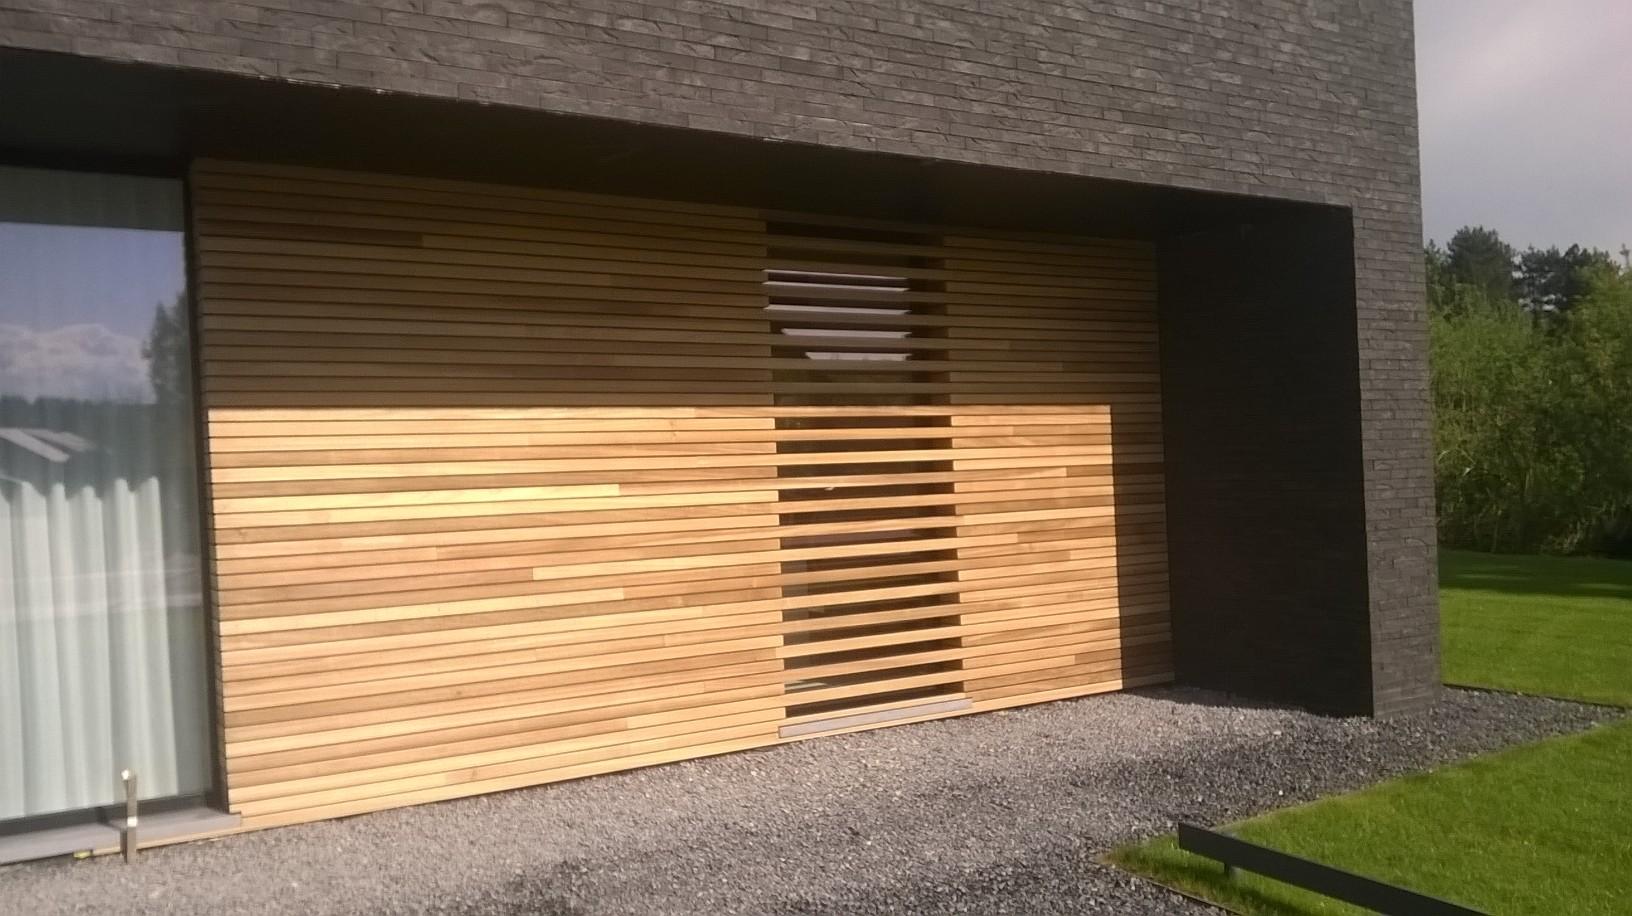 Werk in uitvoering houten gevelbekleding sd schrijnwerkerij sd schrijnwerkerij - Latwerk houten ...